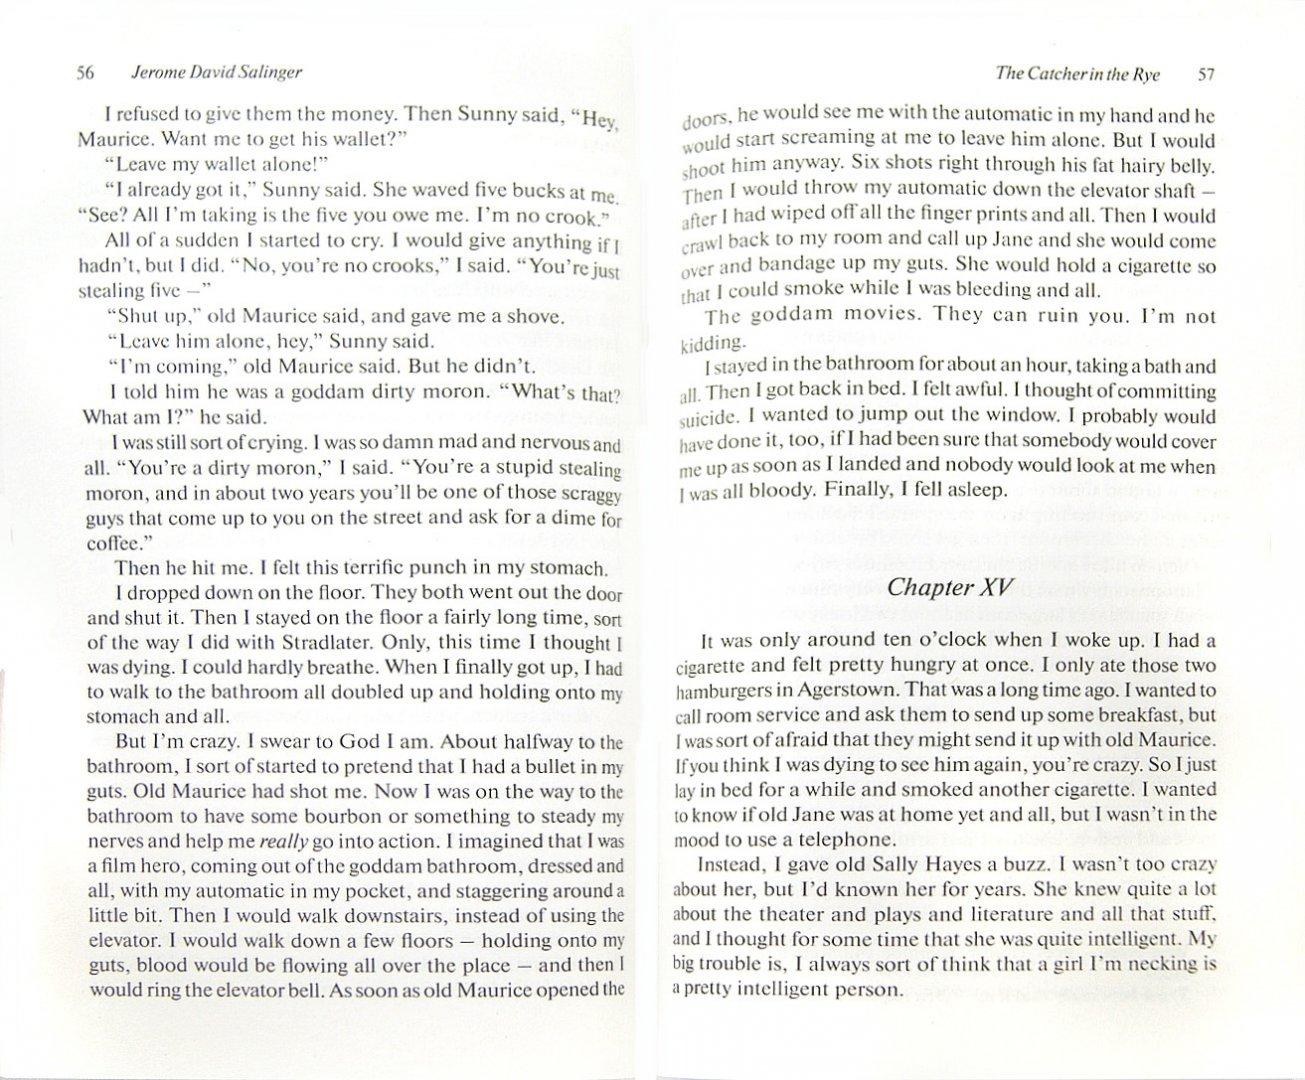 Иллюстрация 1 из 31 для The Catсher in the Rye - Jerome Salinger | Лабиринт - книги. Источник: Лабиринт